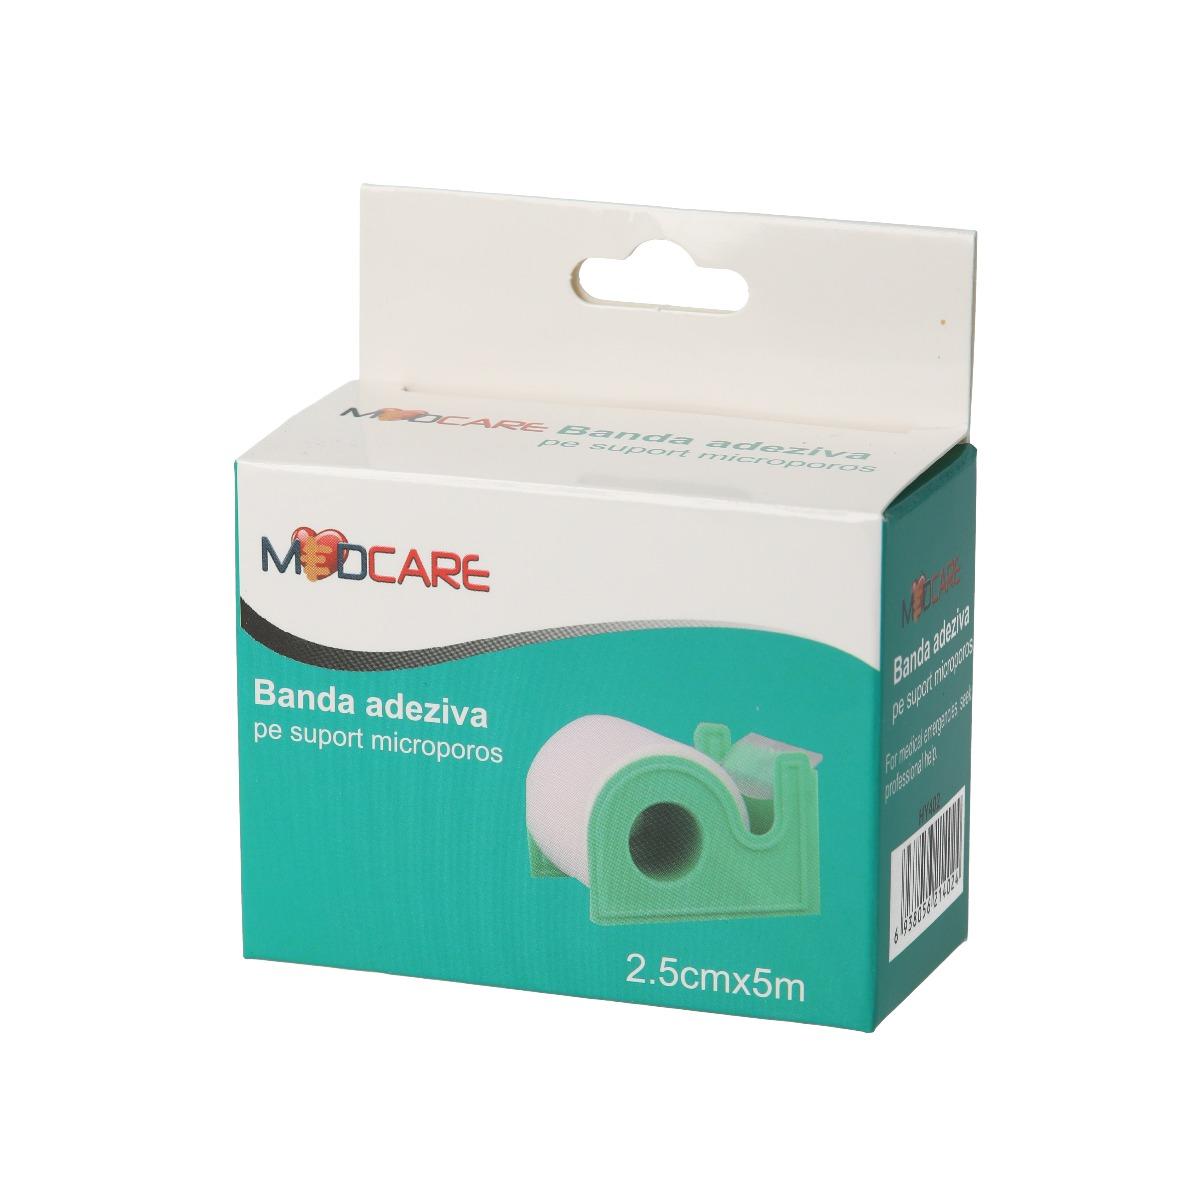 Banda adeziva pe suport microporos, 2.5 cm x 5 m, Medcare drmax.ro